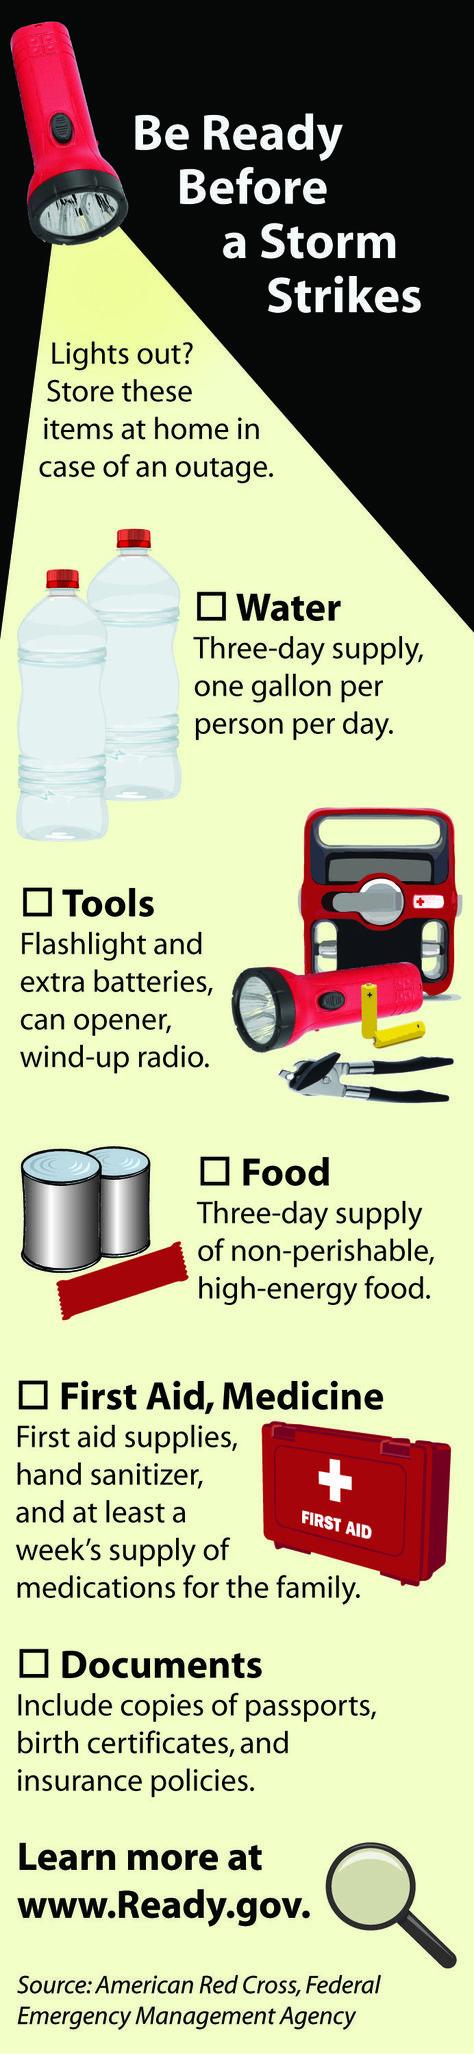 Preparedness ideas